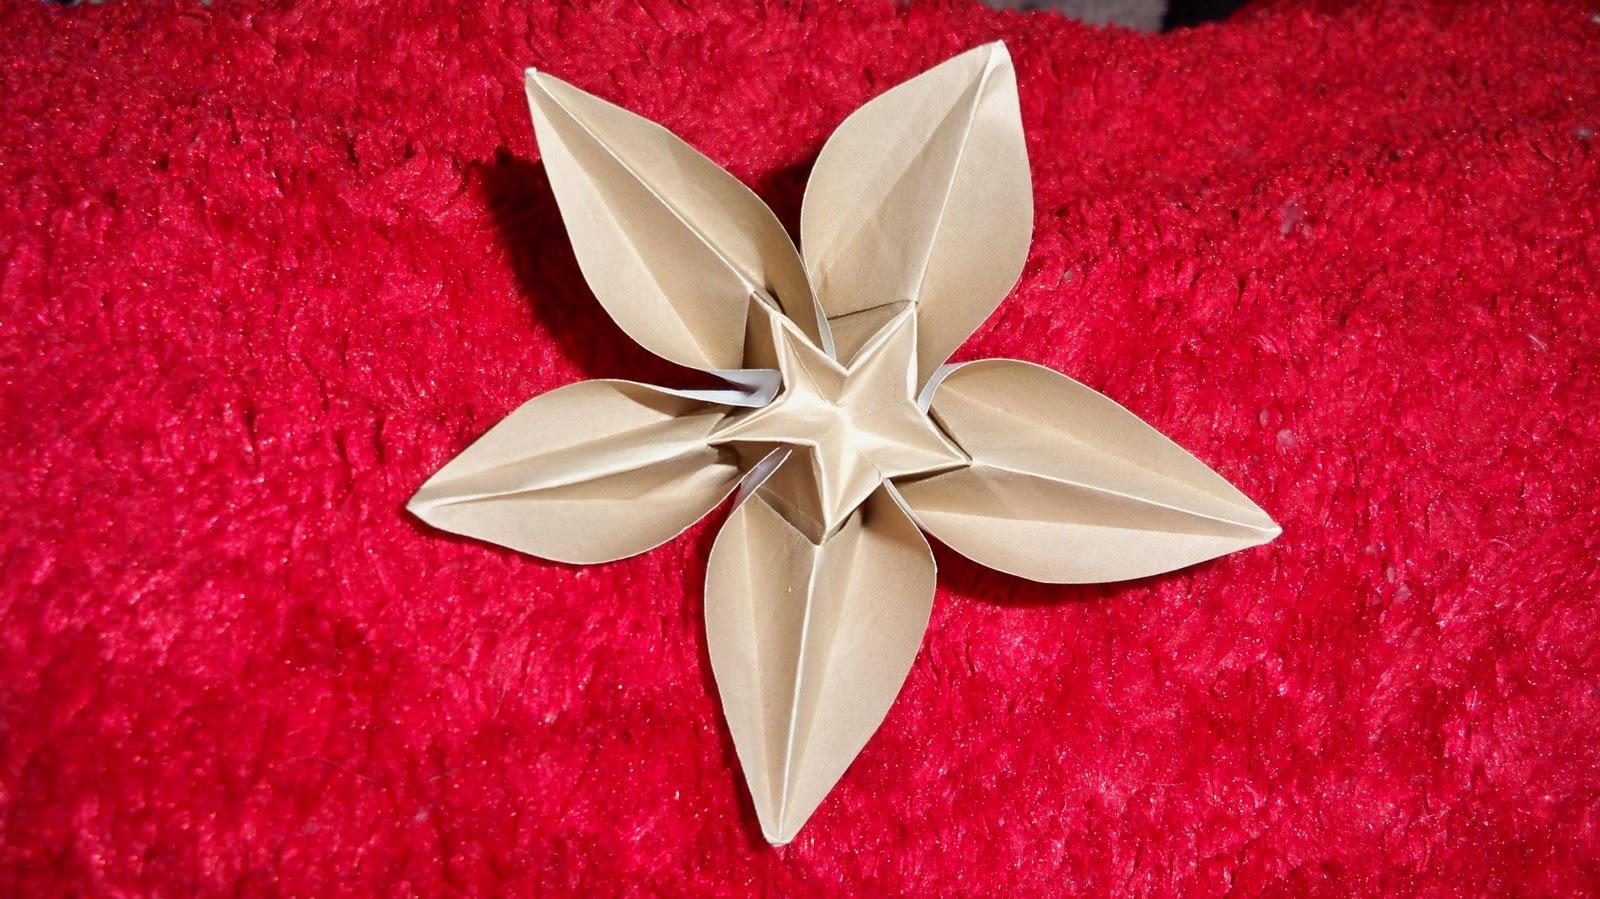 Paperbelle Origami Origami Pieces